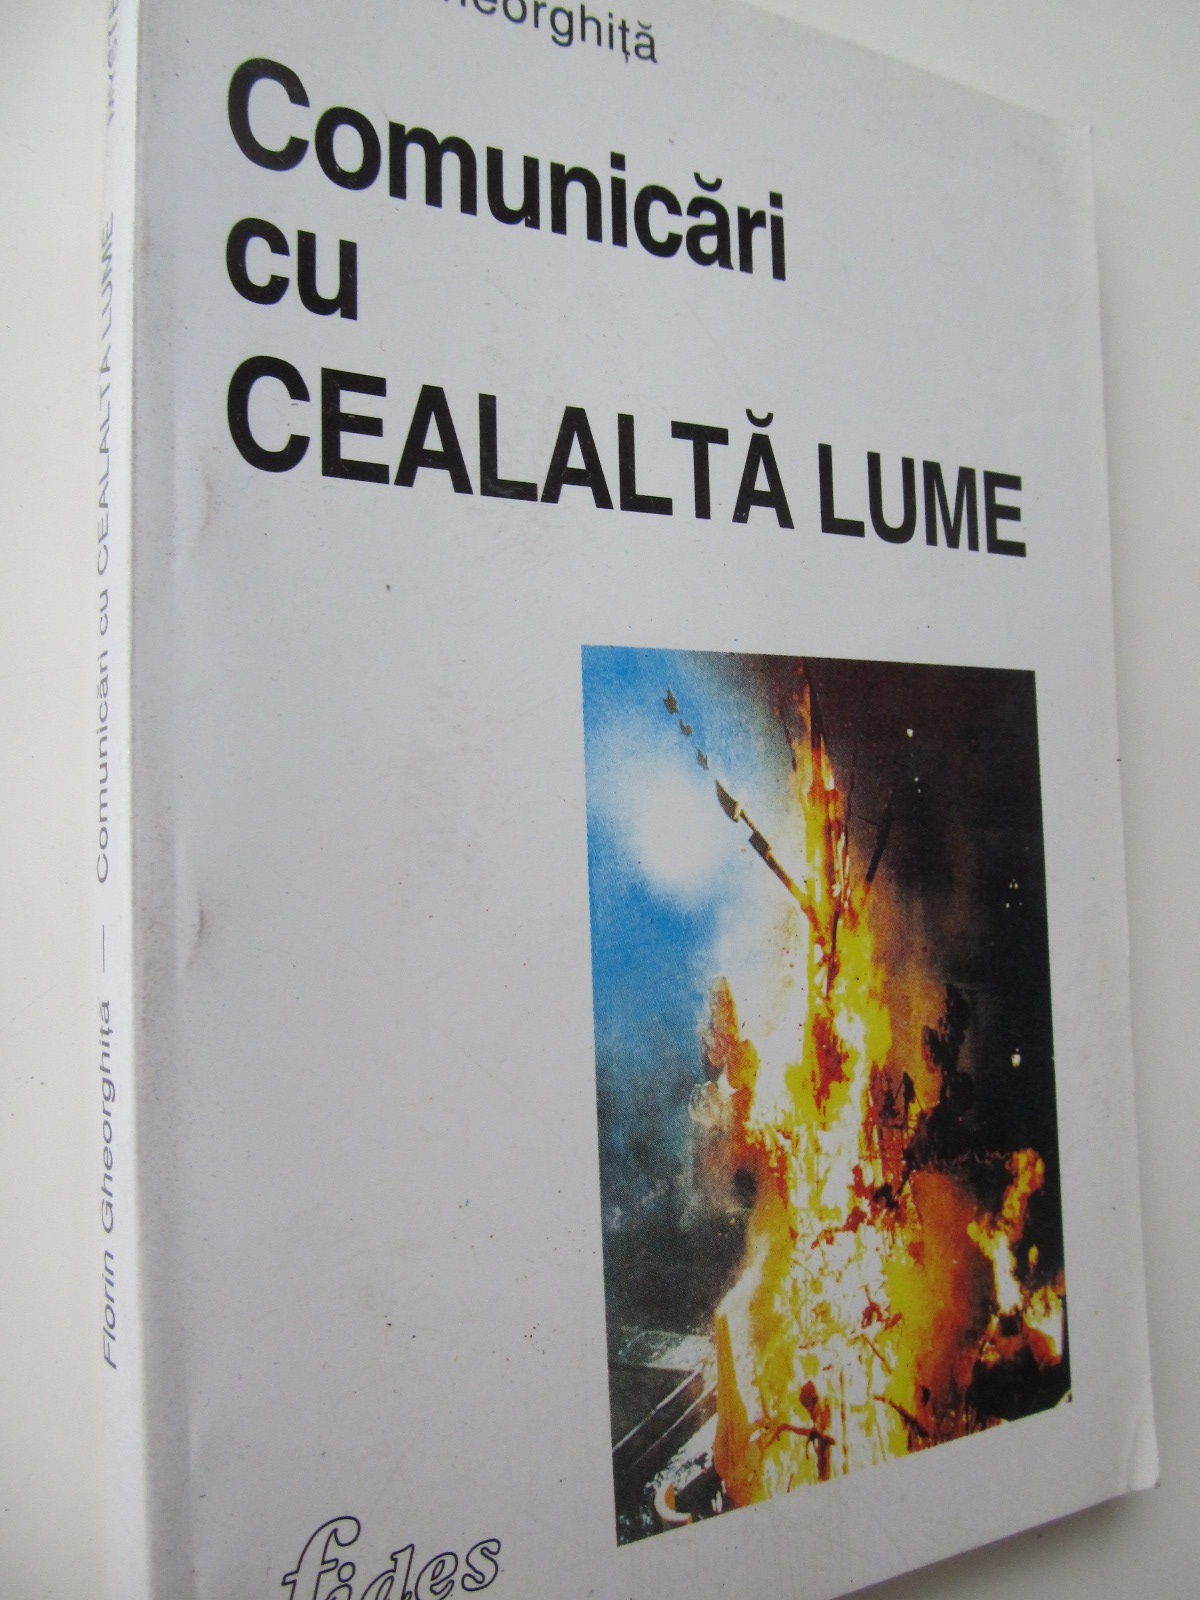 Carte Comunicari cu cealalta lume - Florin Gheorghita